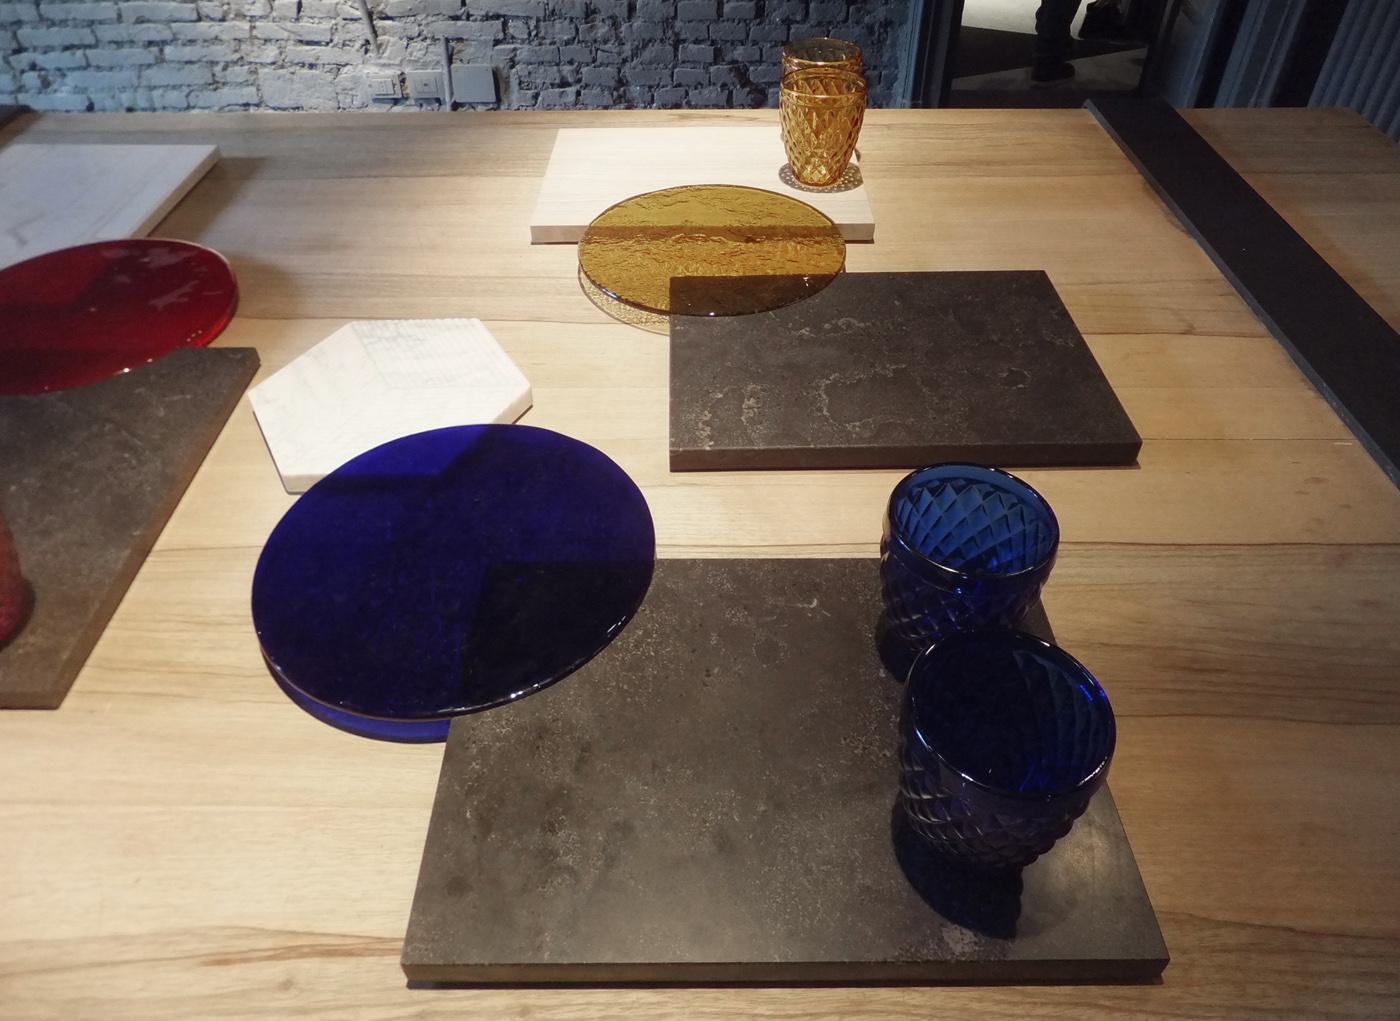 07_Salvatori_marmo_Plat-eau glass_Silvia Fanticelli